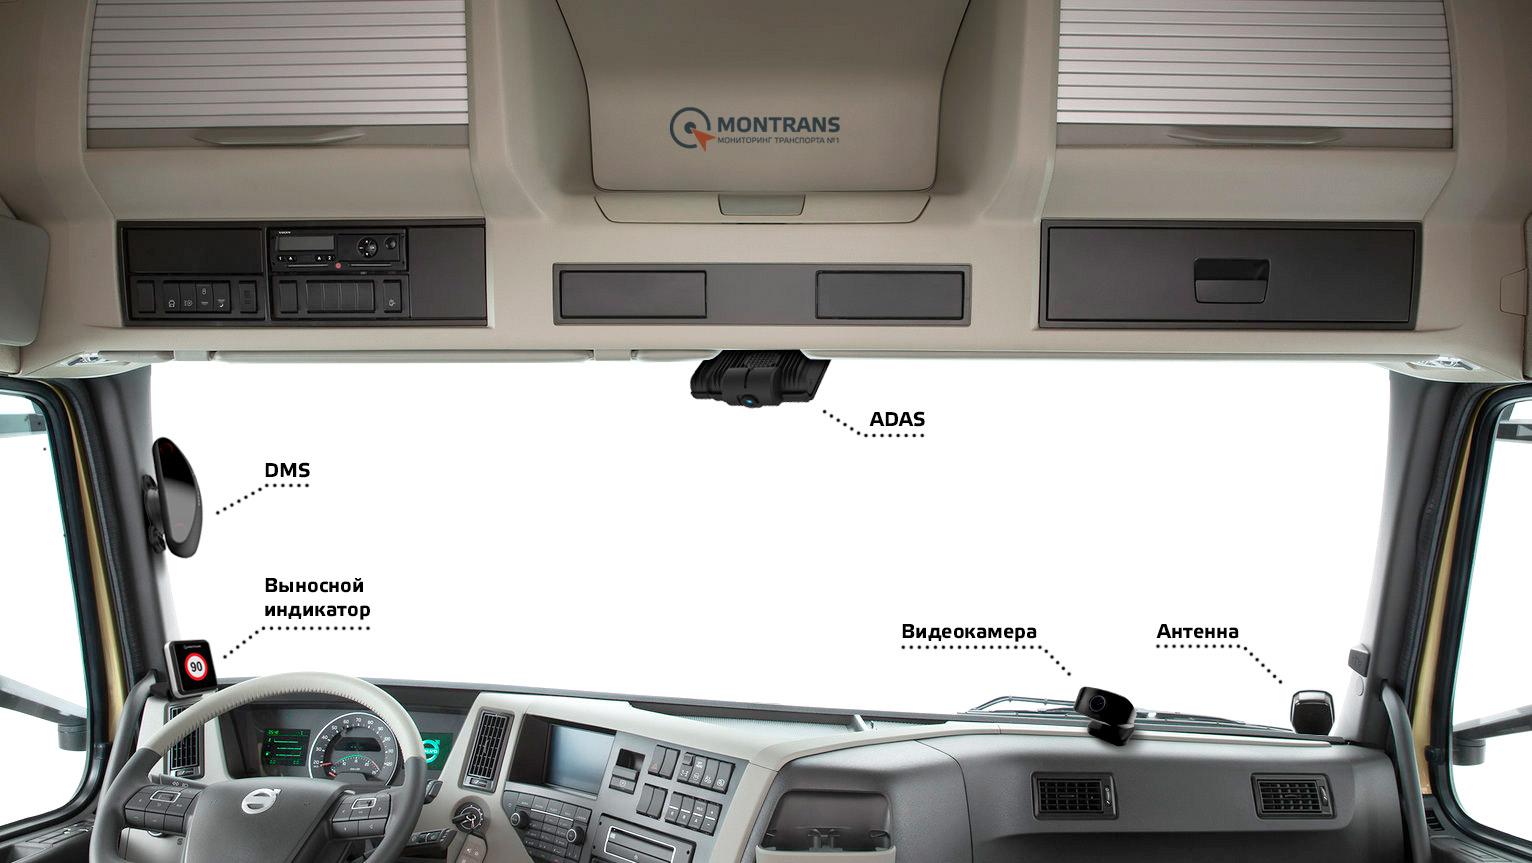 Система помощи водителю MDVR